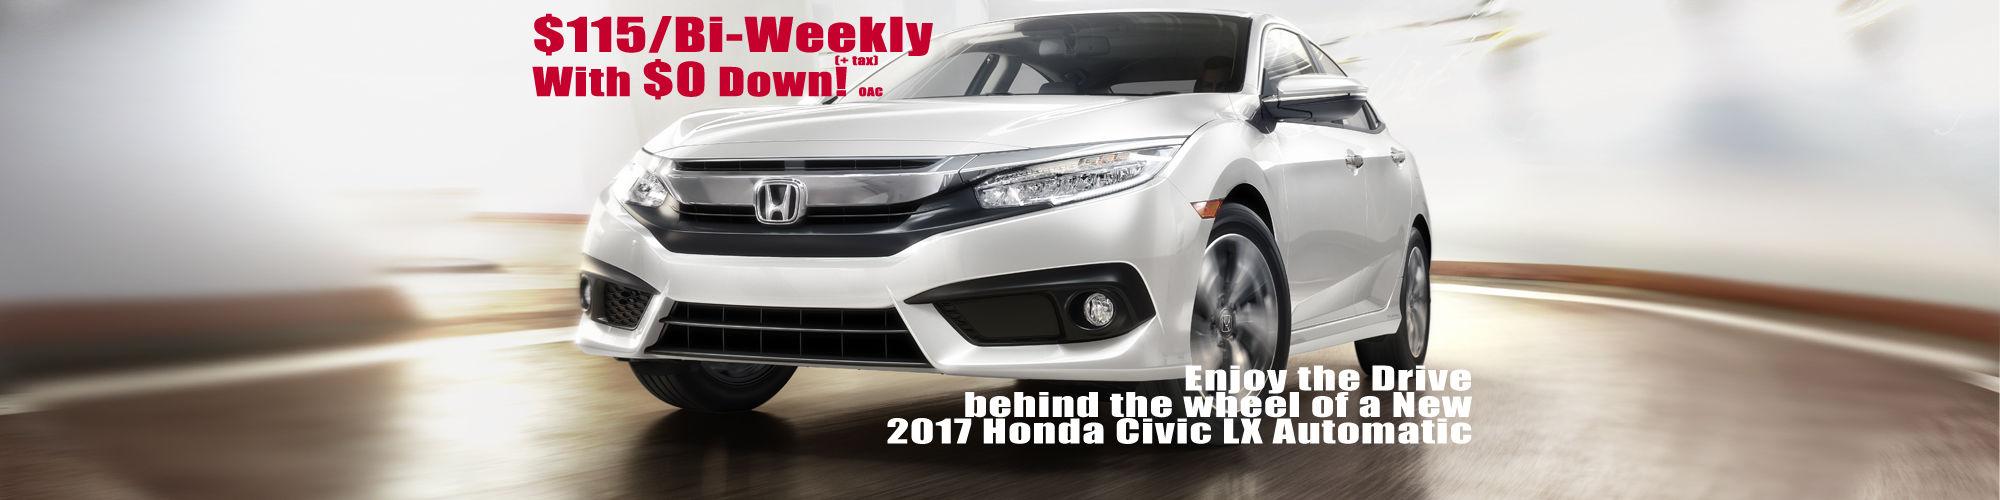 2017 Automatic Honda Civic on Sale!